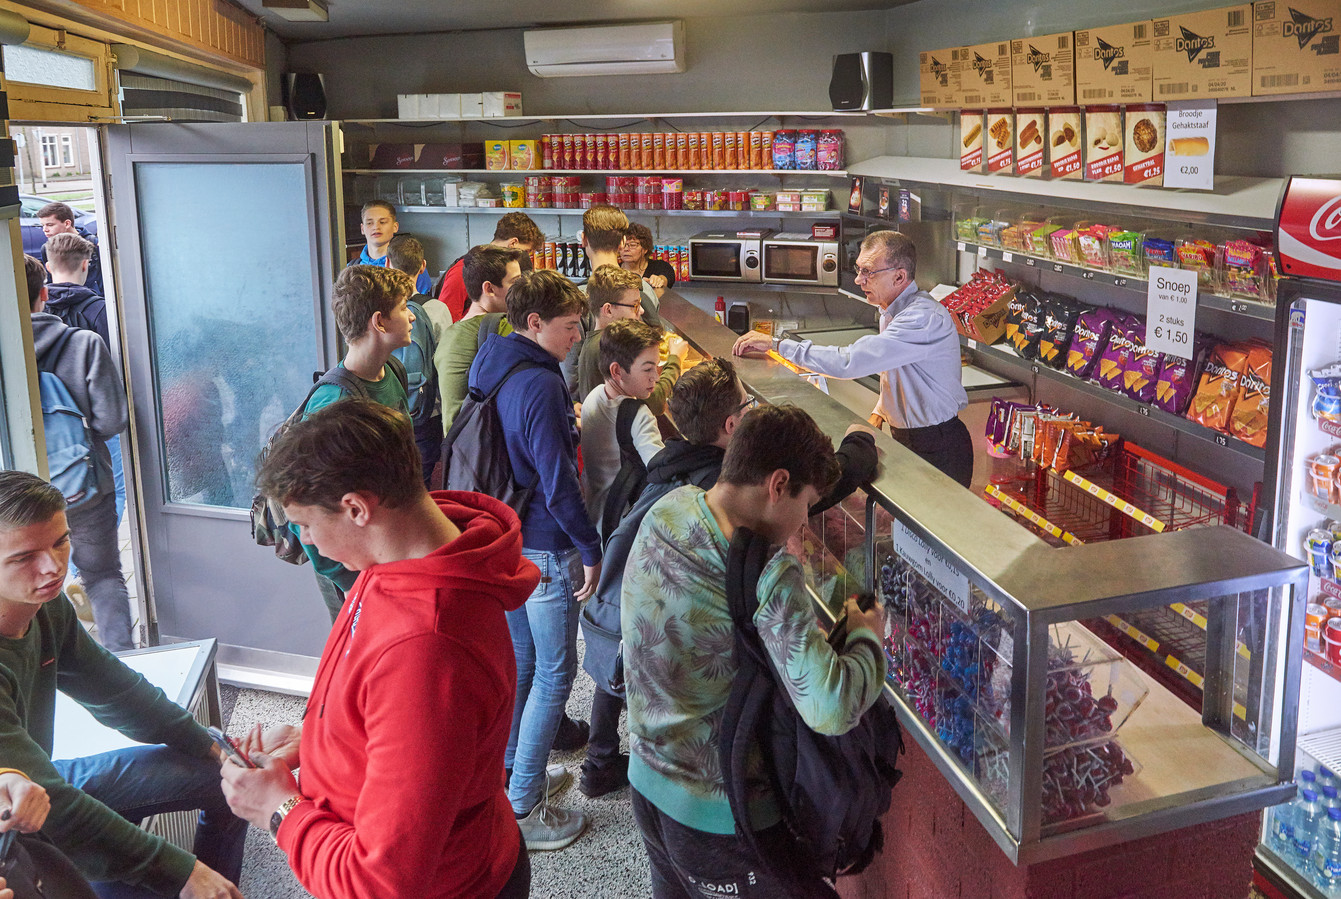 John en José tijdens het spitsuur in 't Snoepwinkeltje.